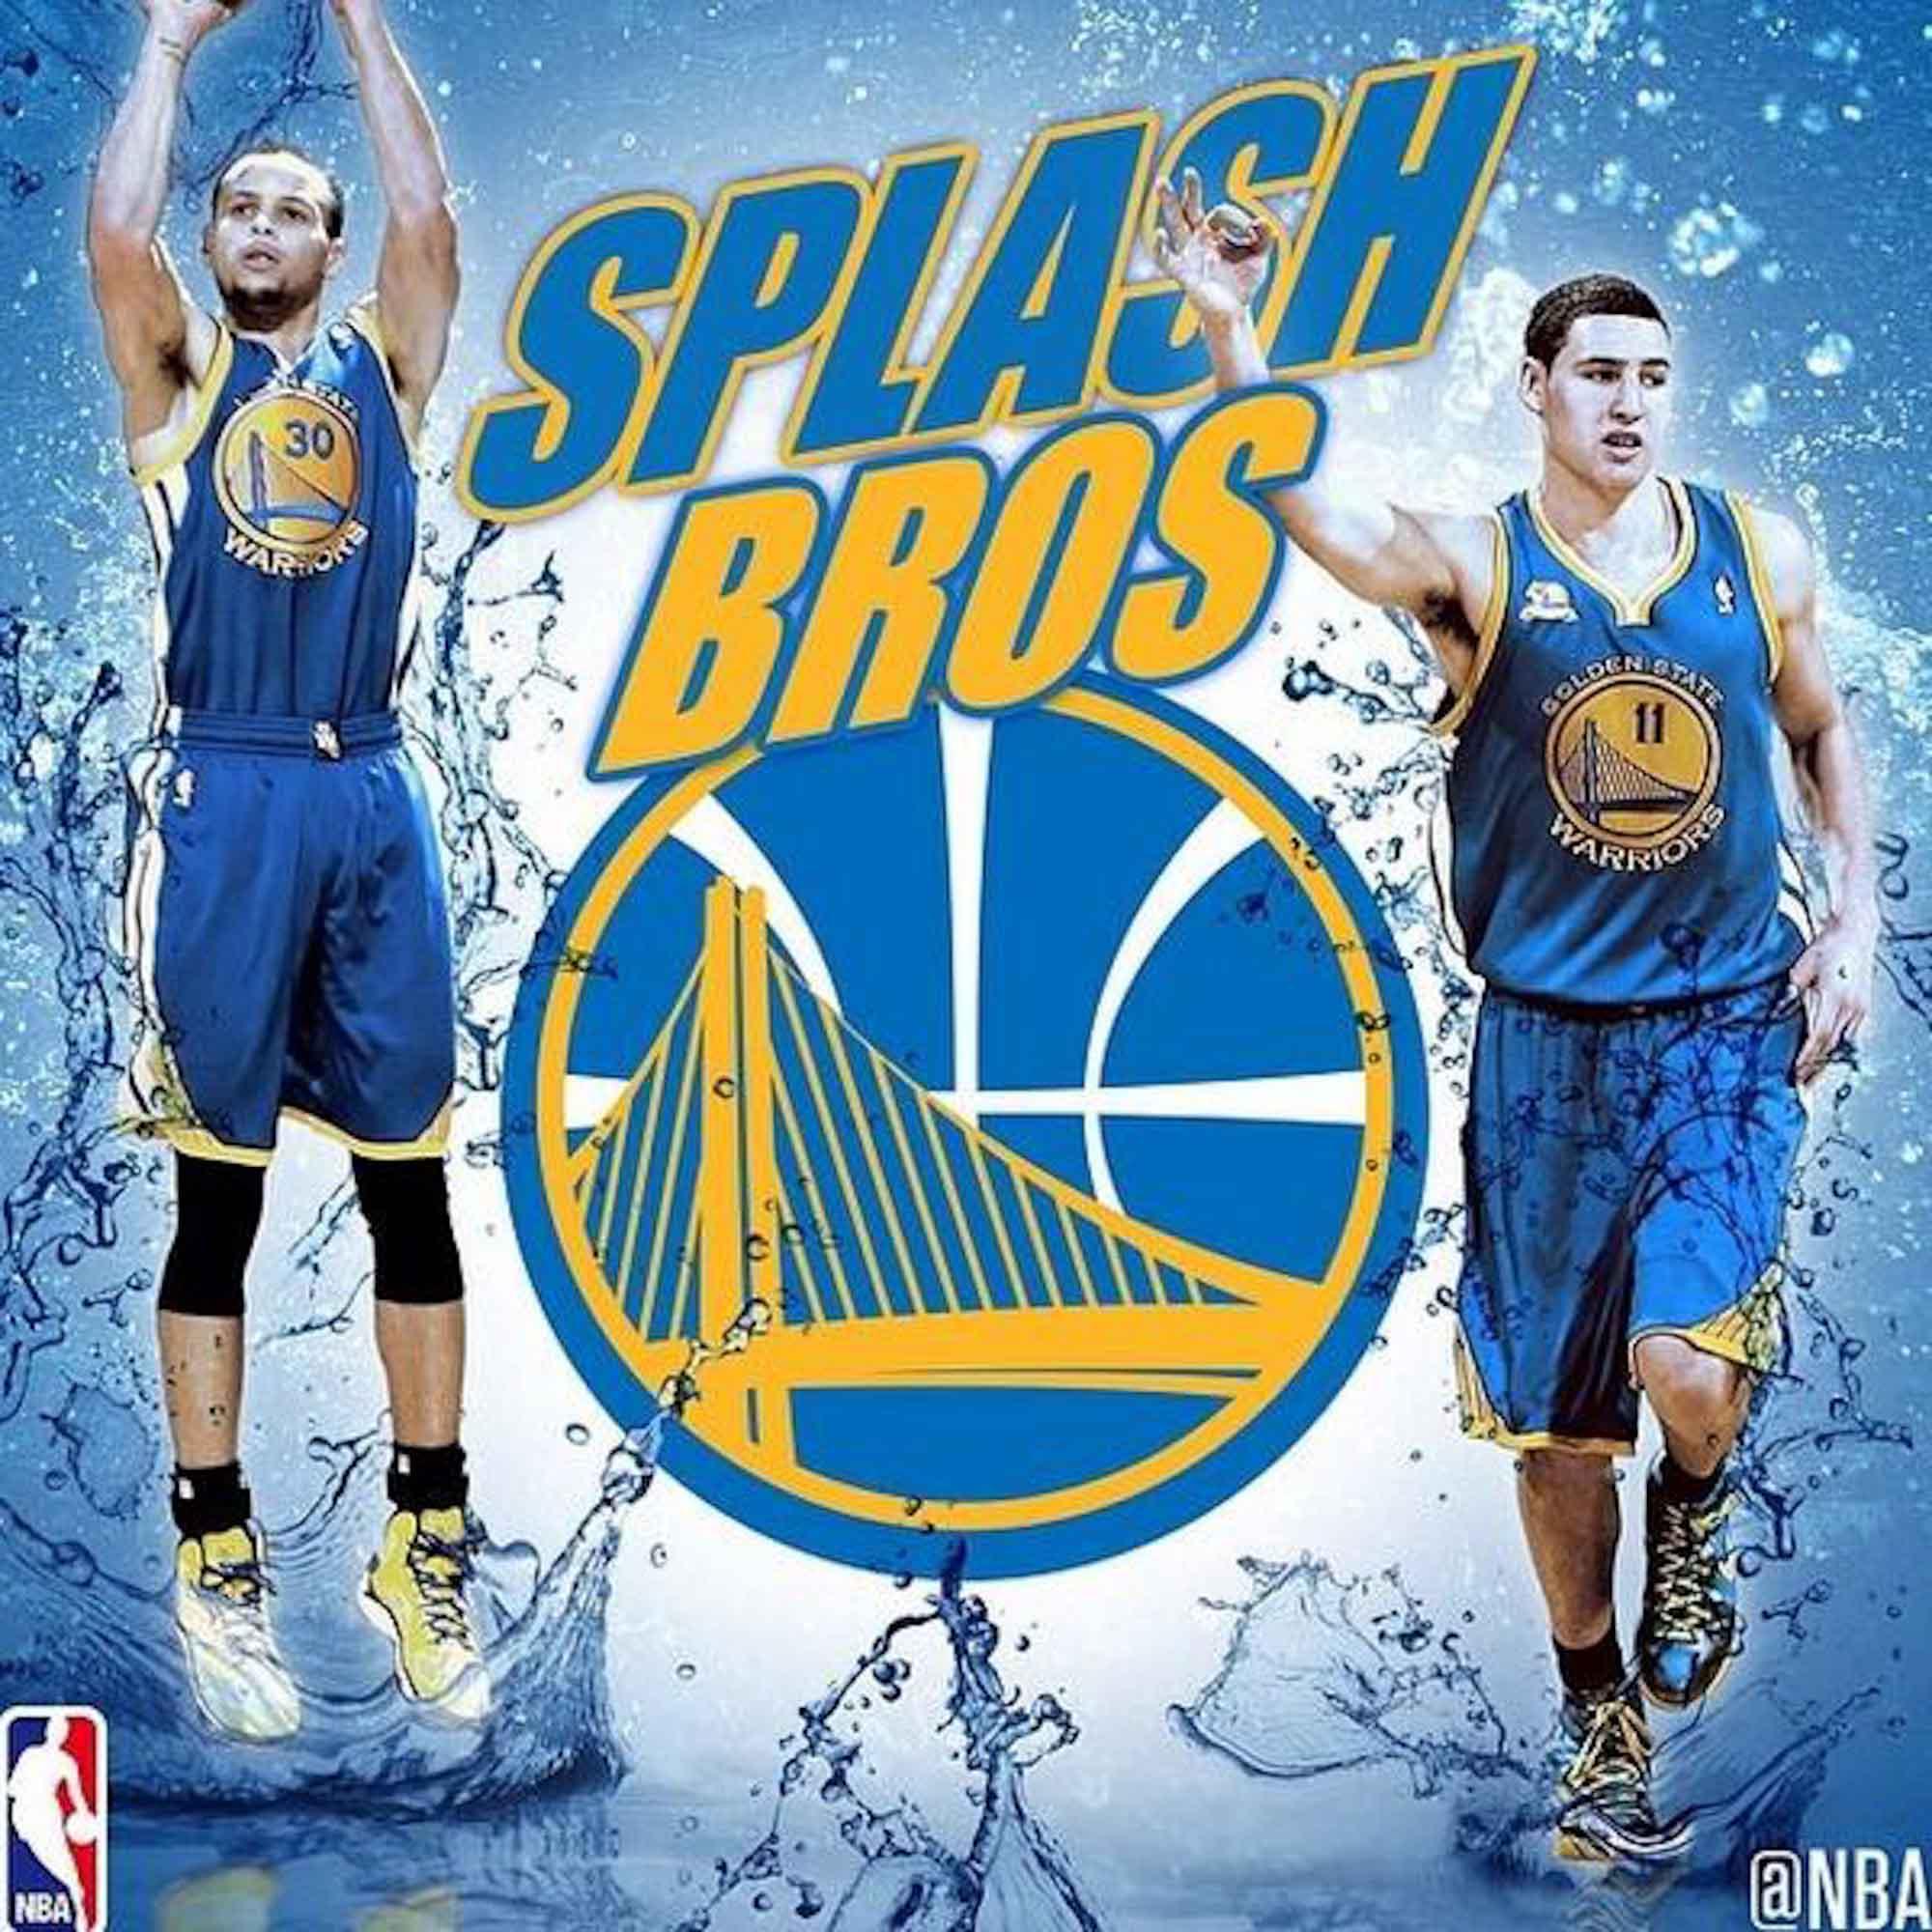 Splash Bros Stephen Curry Wallpaper 4755 Wallpaper Download HD 2000x2000